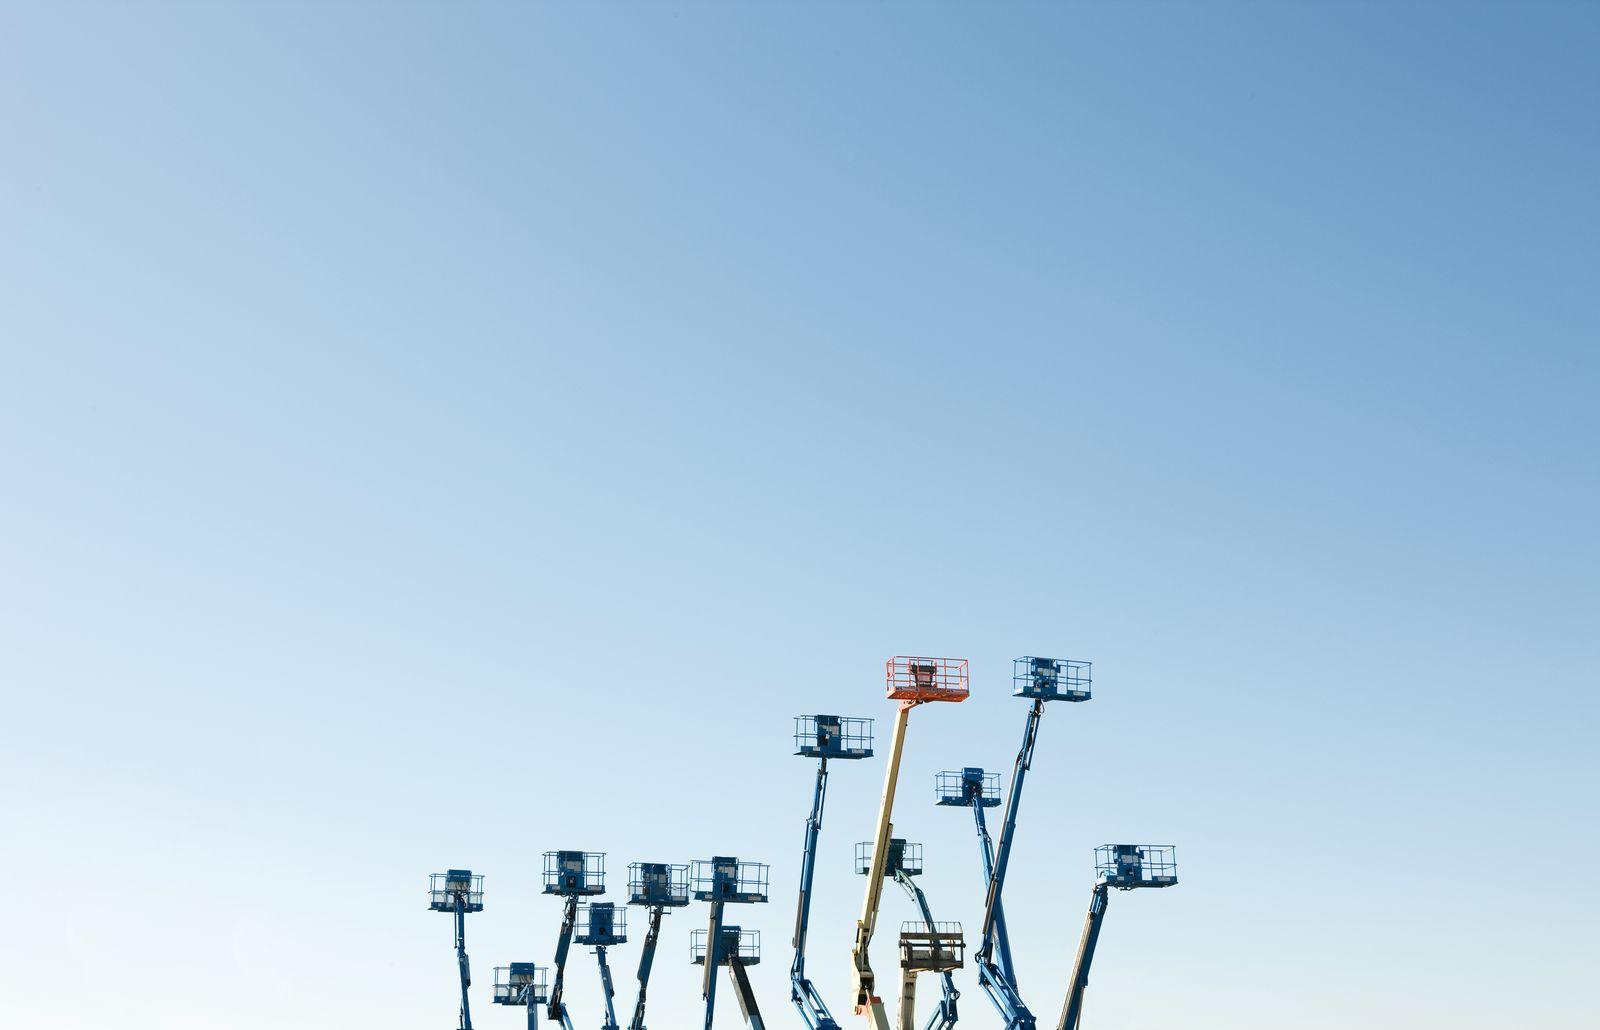 Cherry picker platforms raised against sky